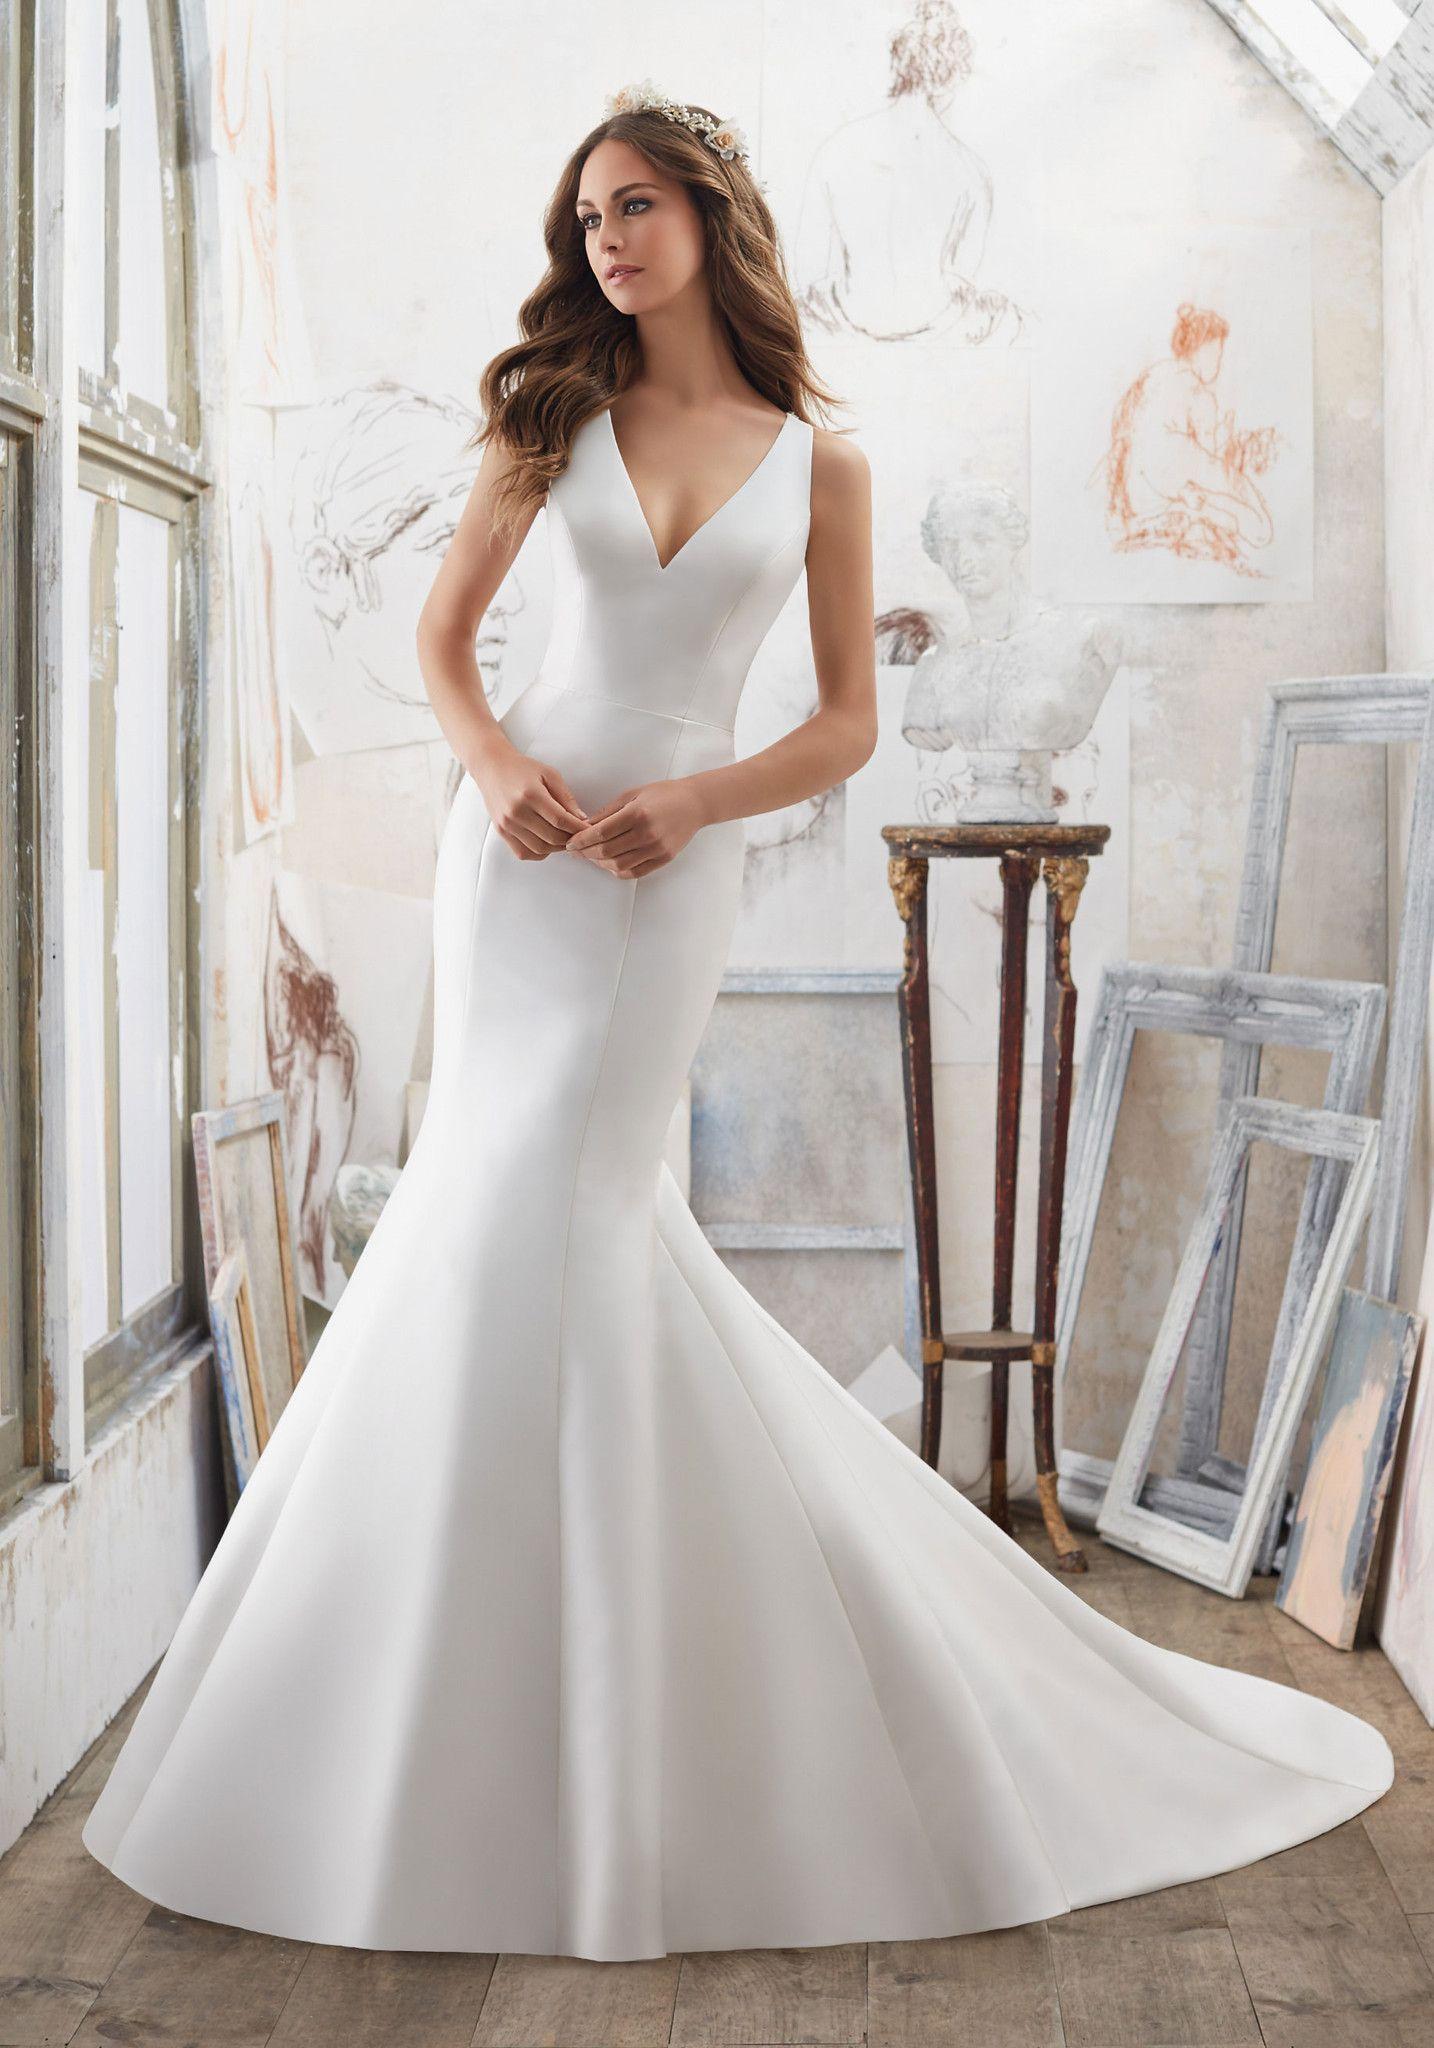 Blu - Marlena - 5506 - All Dressed Up, Bridal Gown ...